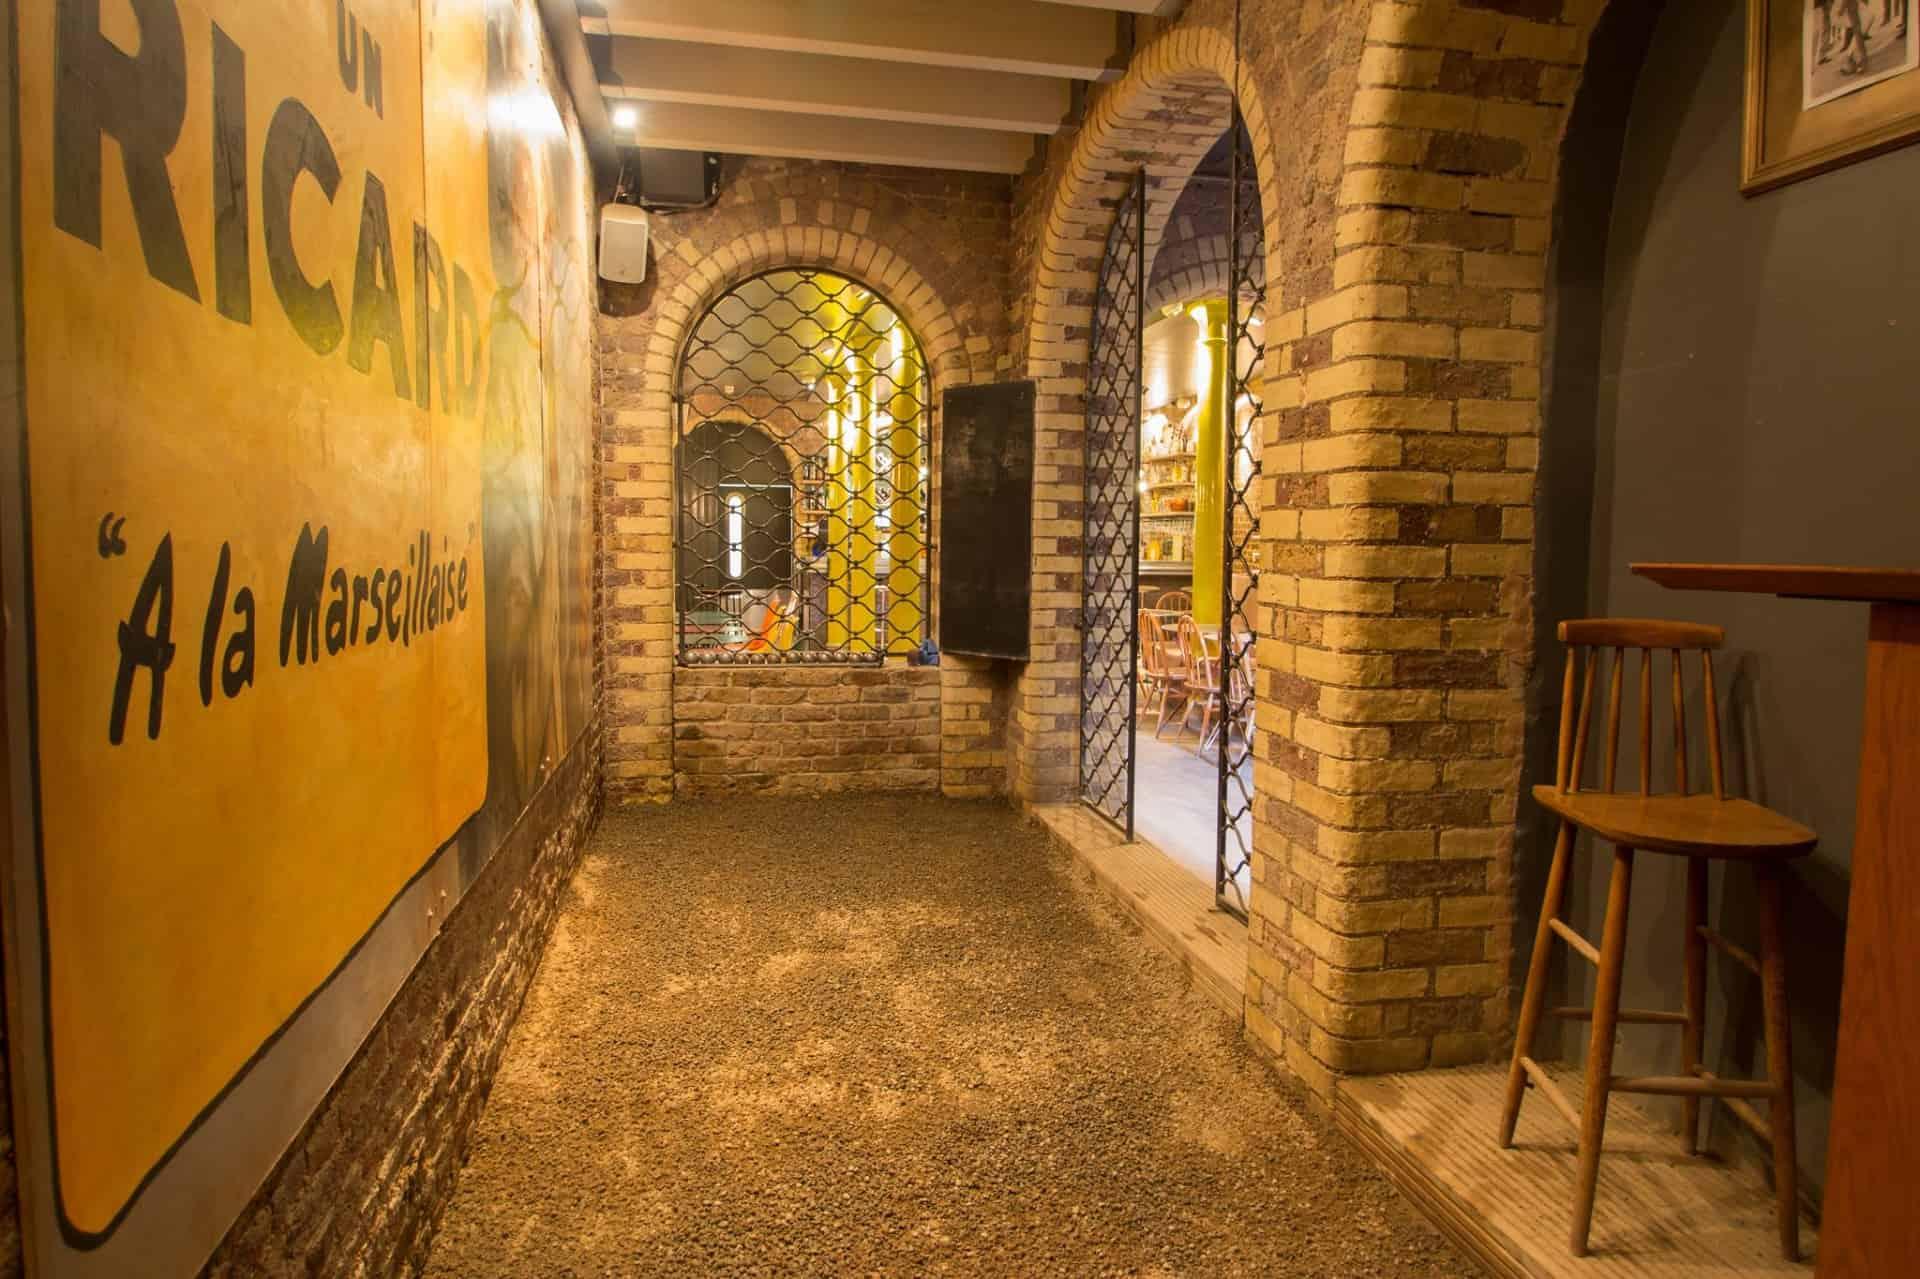 Baranis petanque activity bars